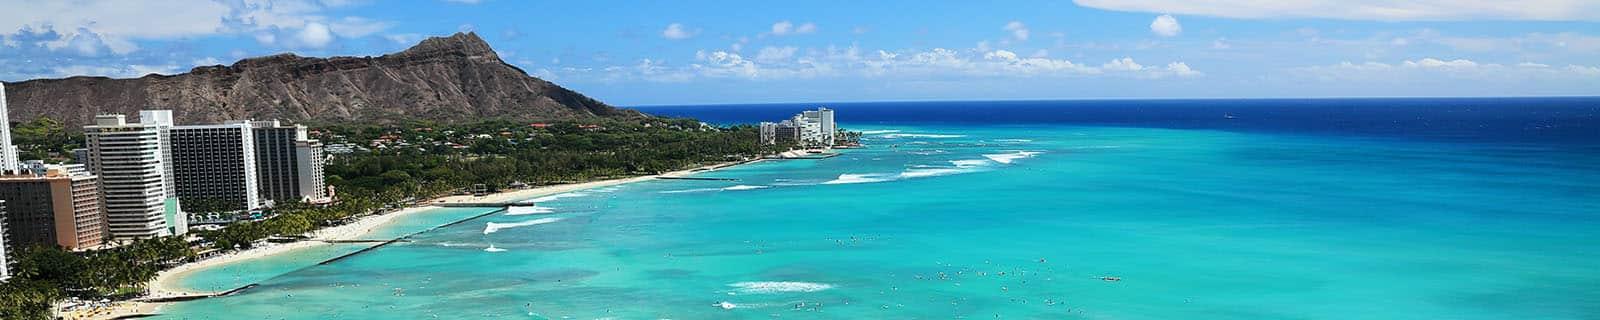 Hawaii Cruise Tours